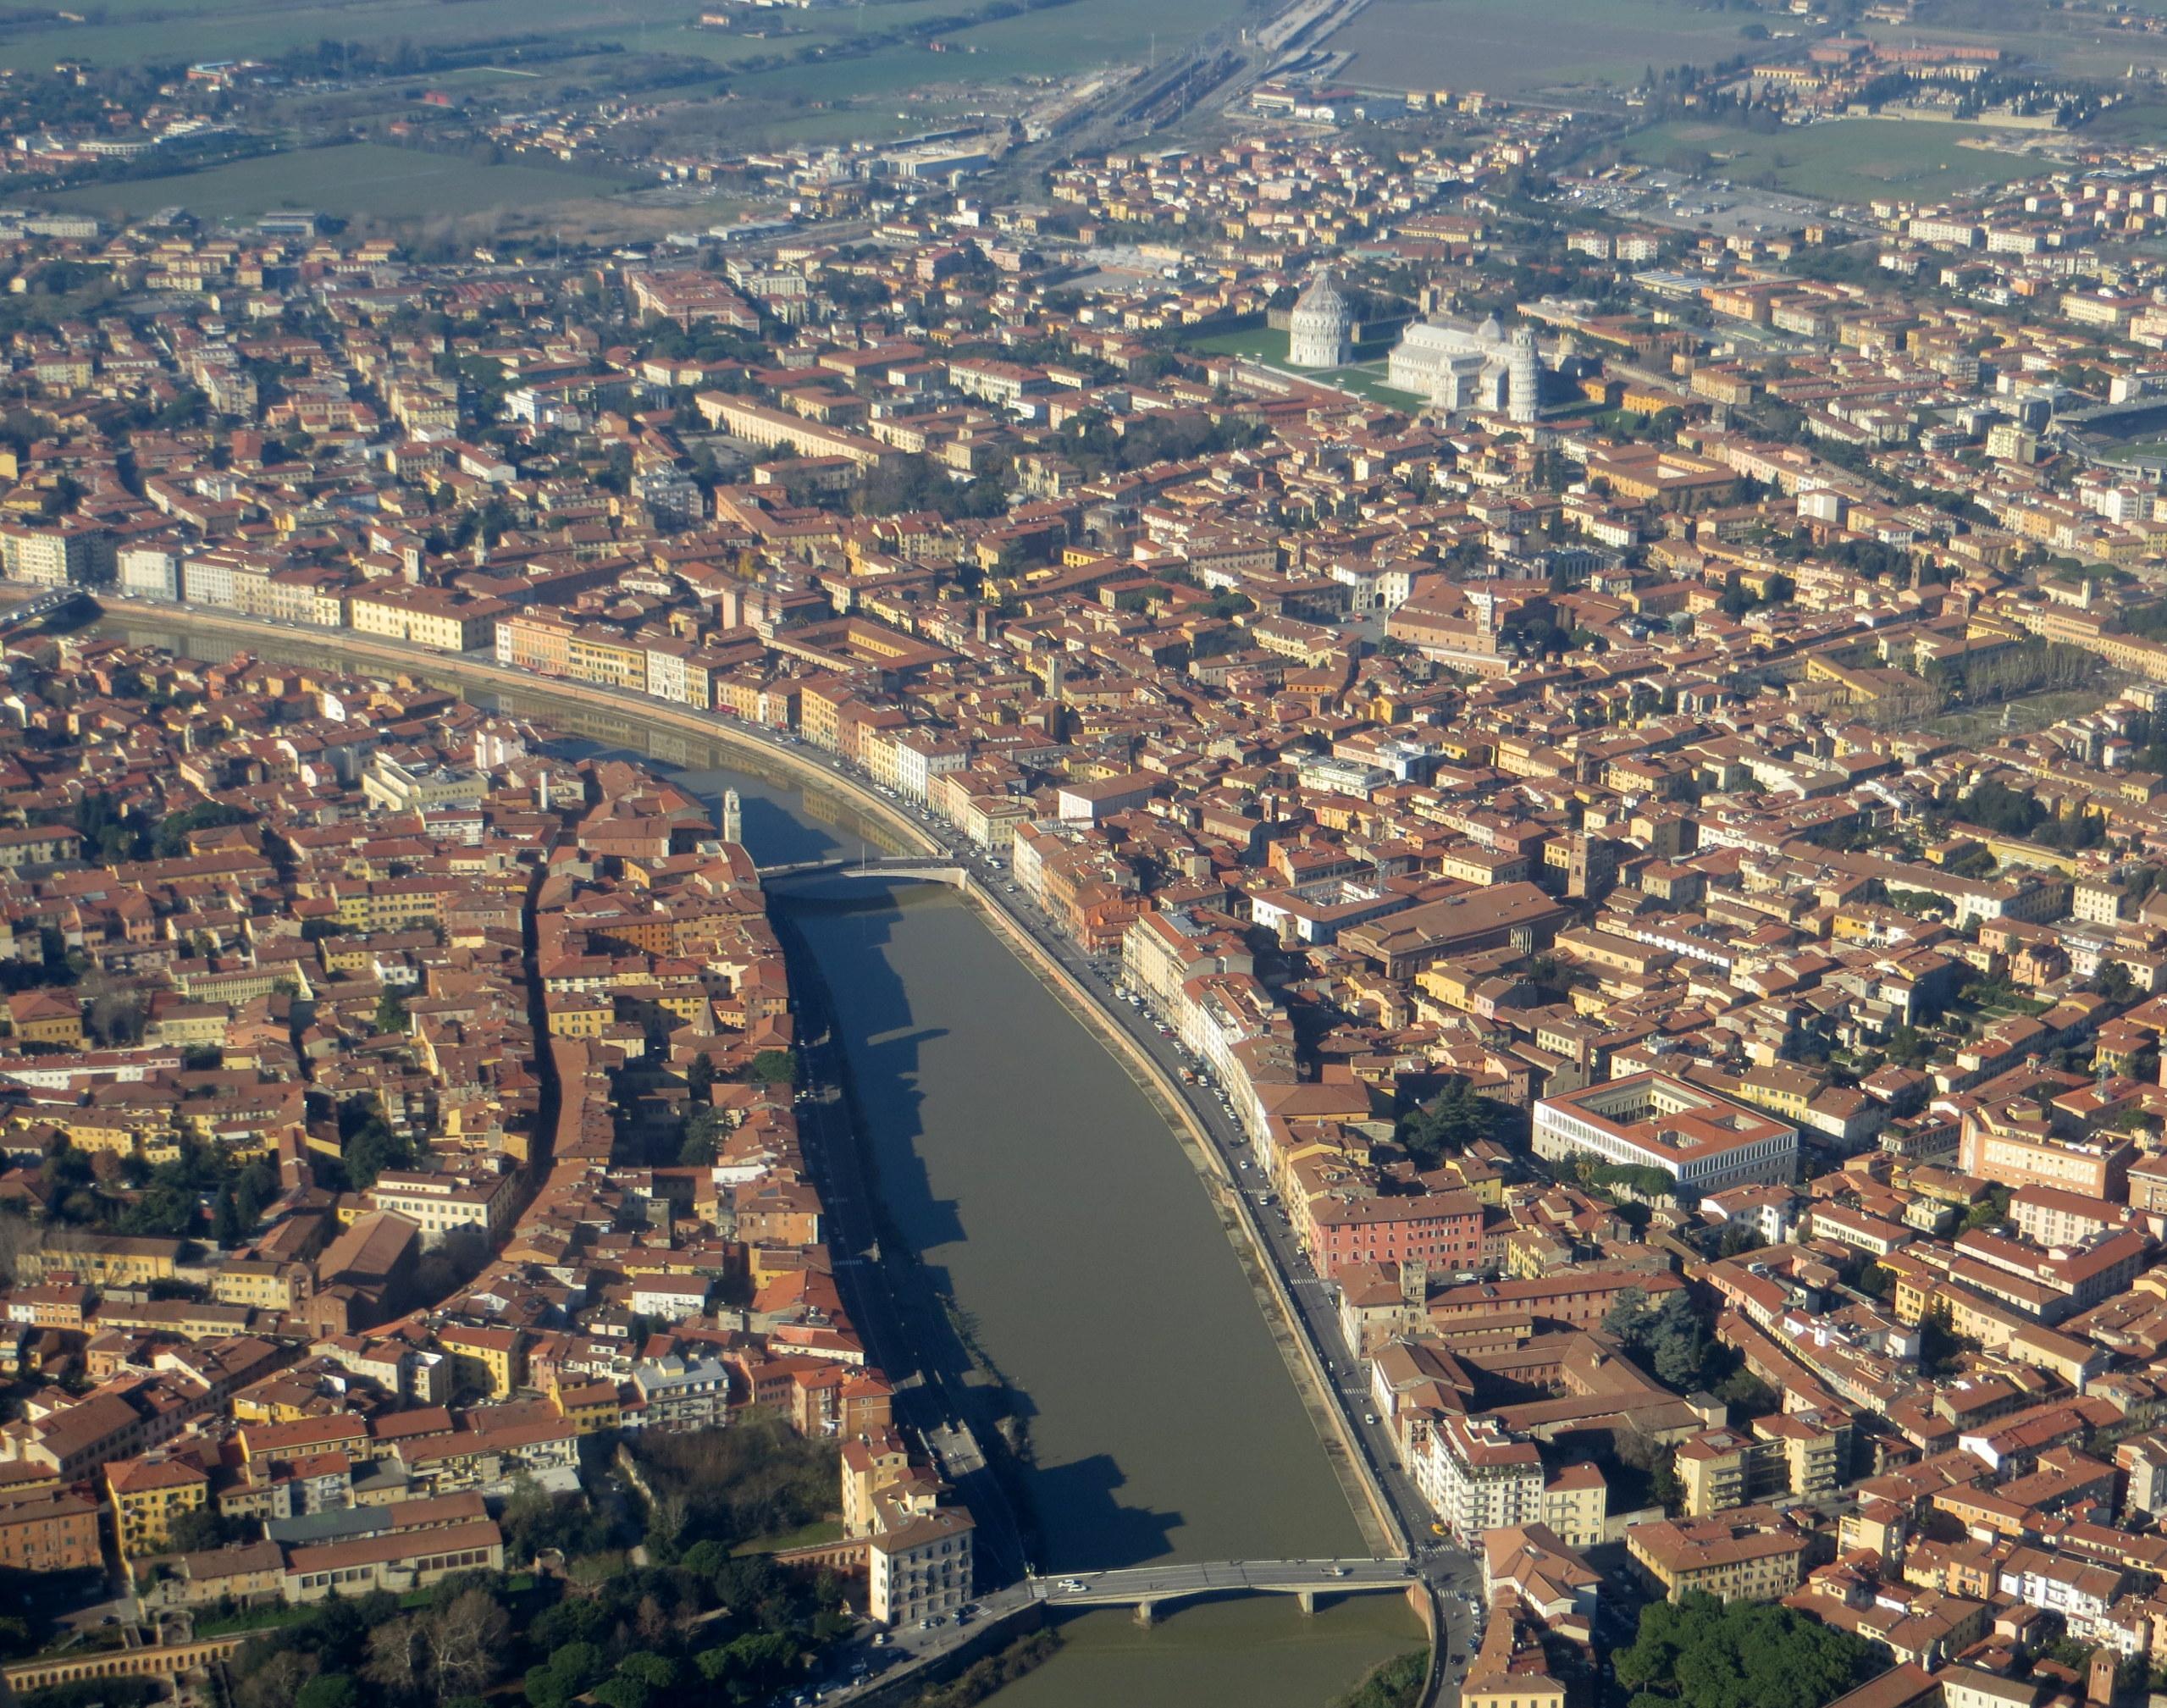 Depiction of Pisa